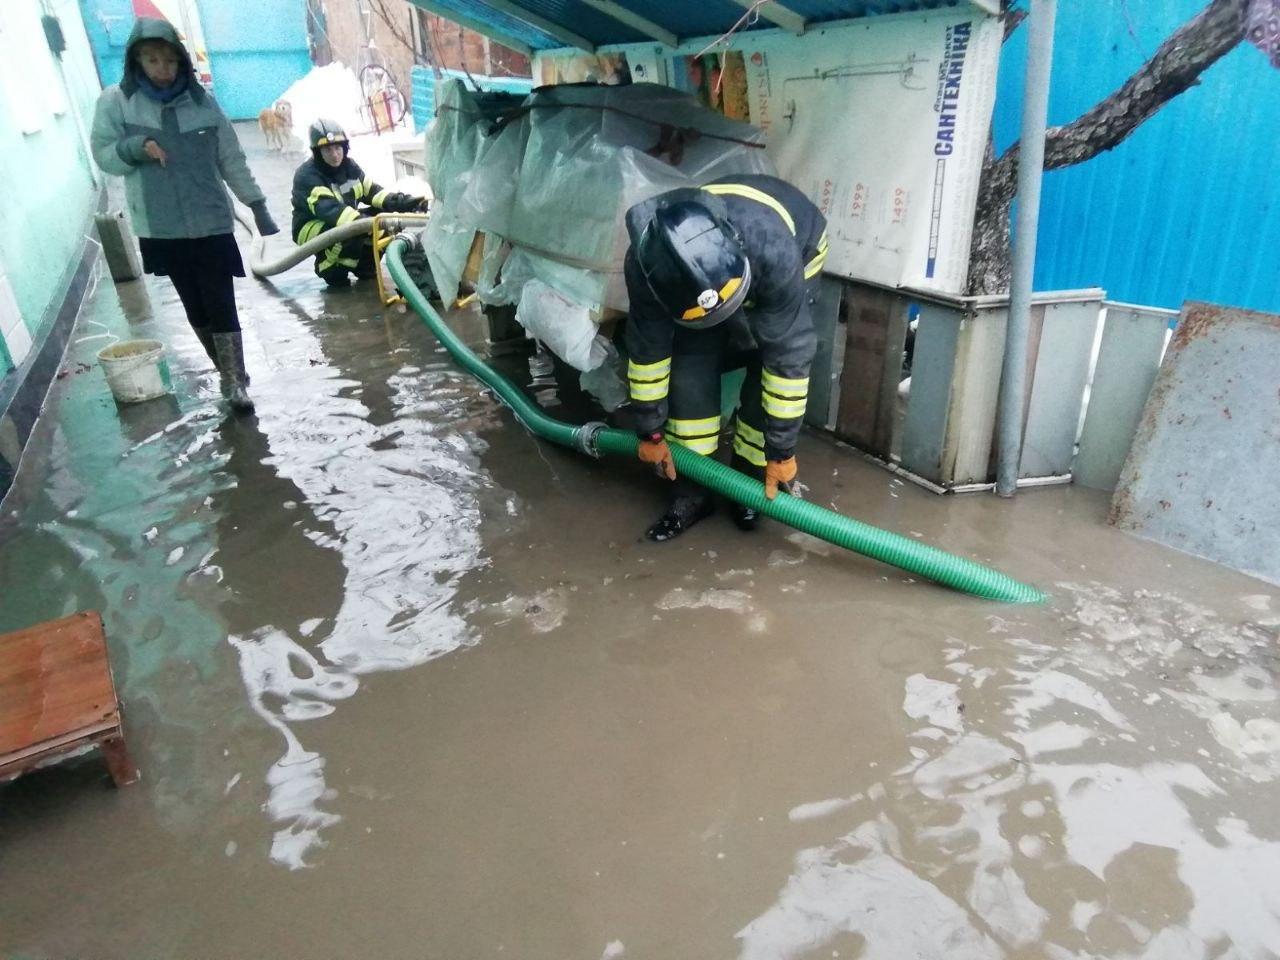 В Одессе дом из-за дождя и снега частично ушёл под воду, - ФОТО, фото-3